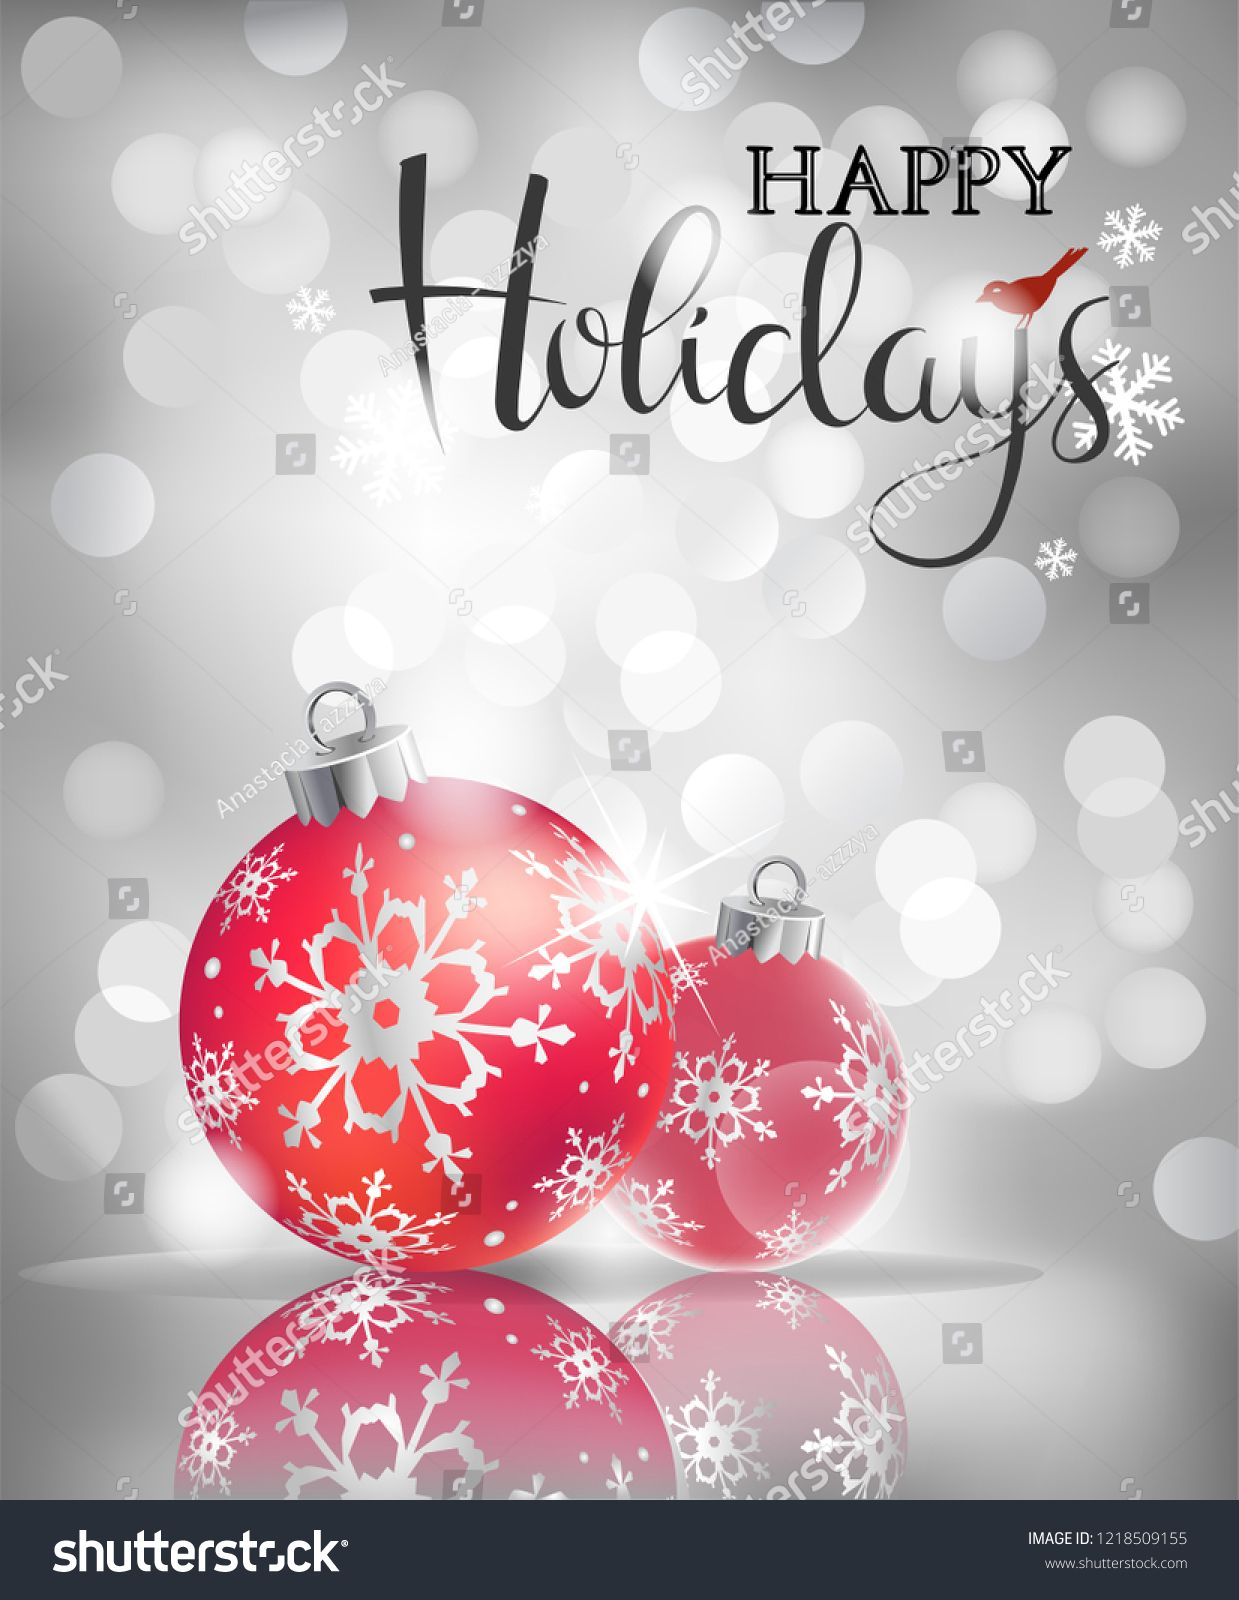 Happy Holidays Greeting Card Vector Holiday Balls On Abstract Silver Lights B Happy Holiday Greeting Cards Happy Holidays Greetings Happy Christmas Greetings